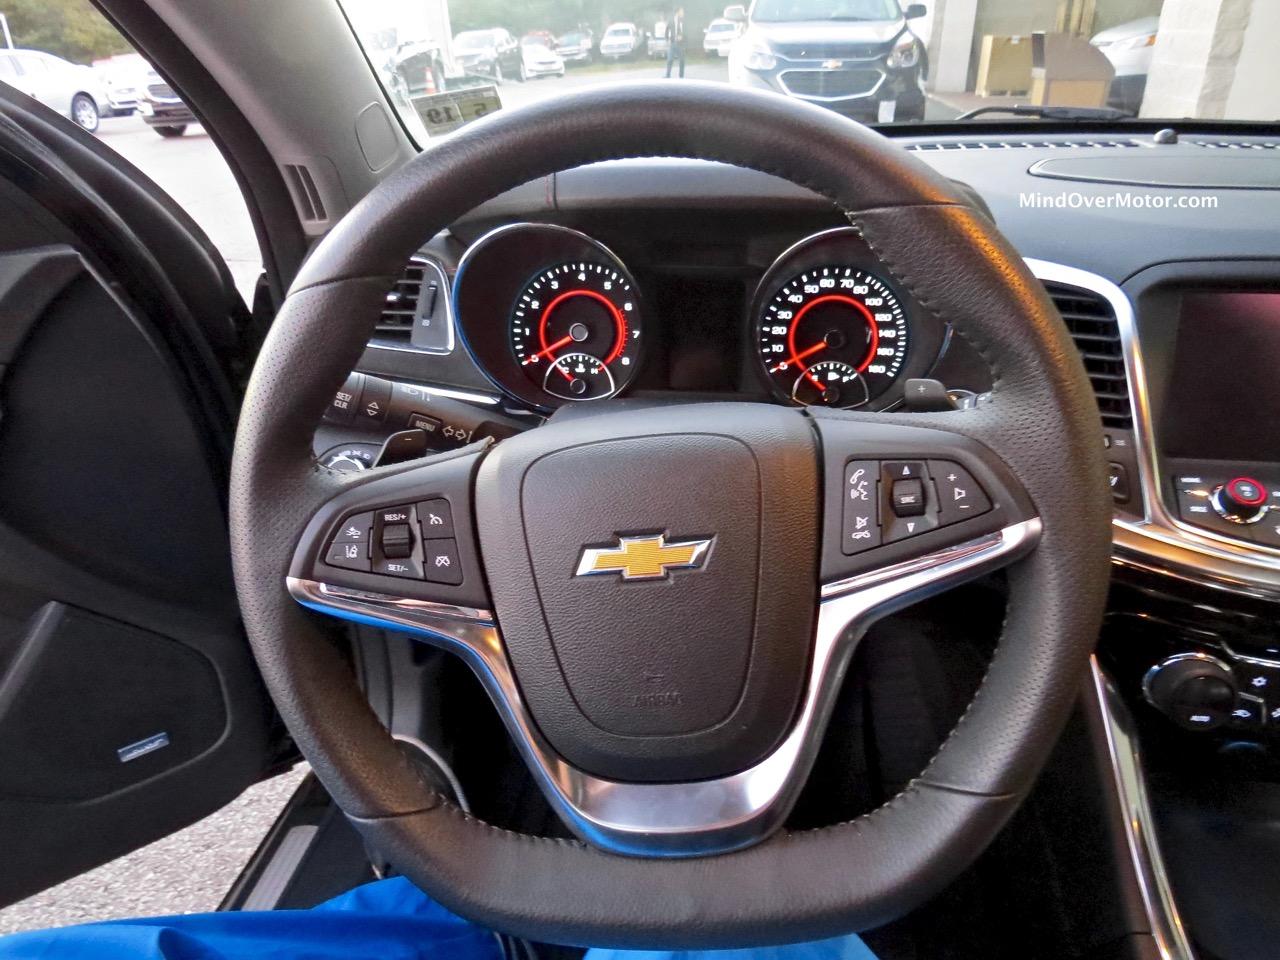 2014 Chevrolet SS Steering Wheel